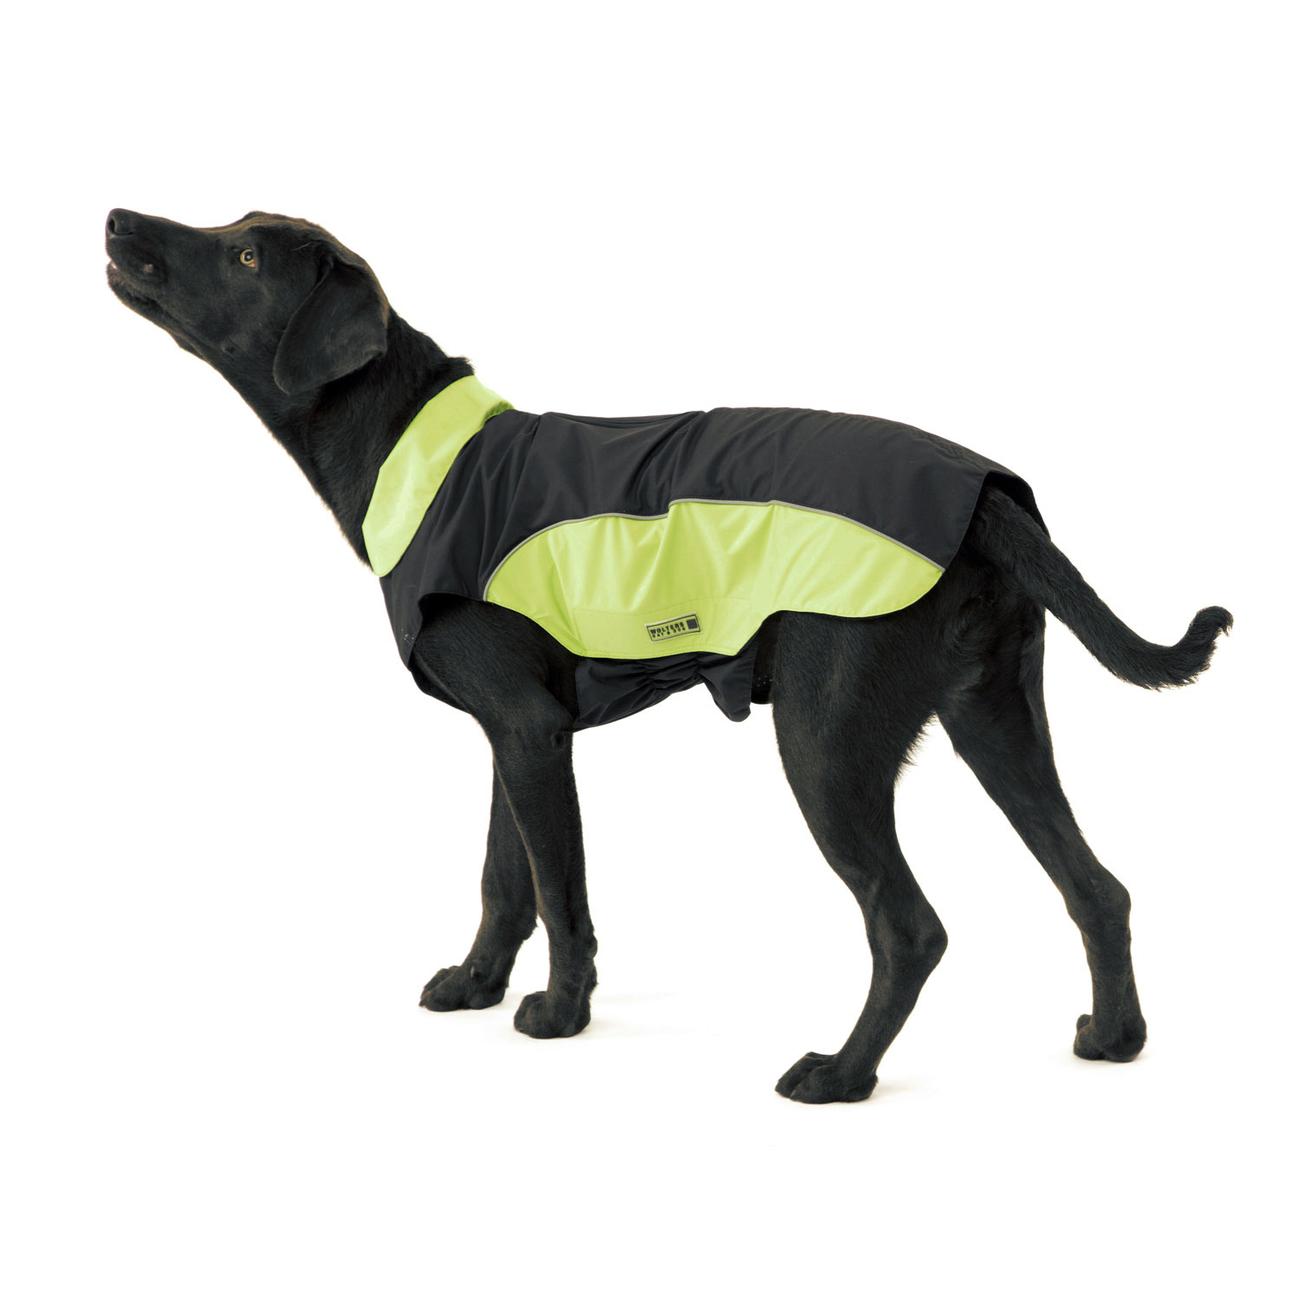 Wolters Regenjacke für Hunde Easy Rain, Bild 4